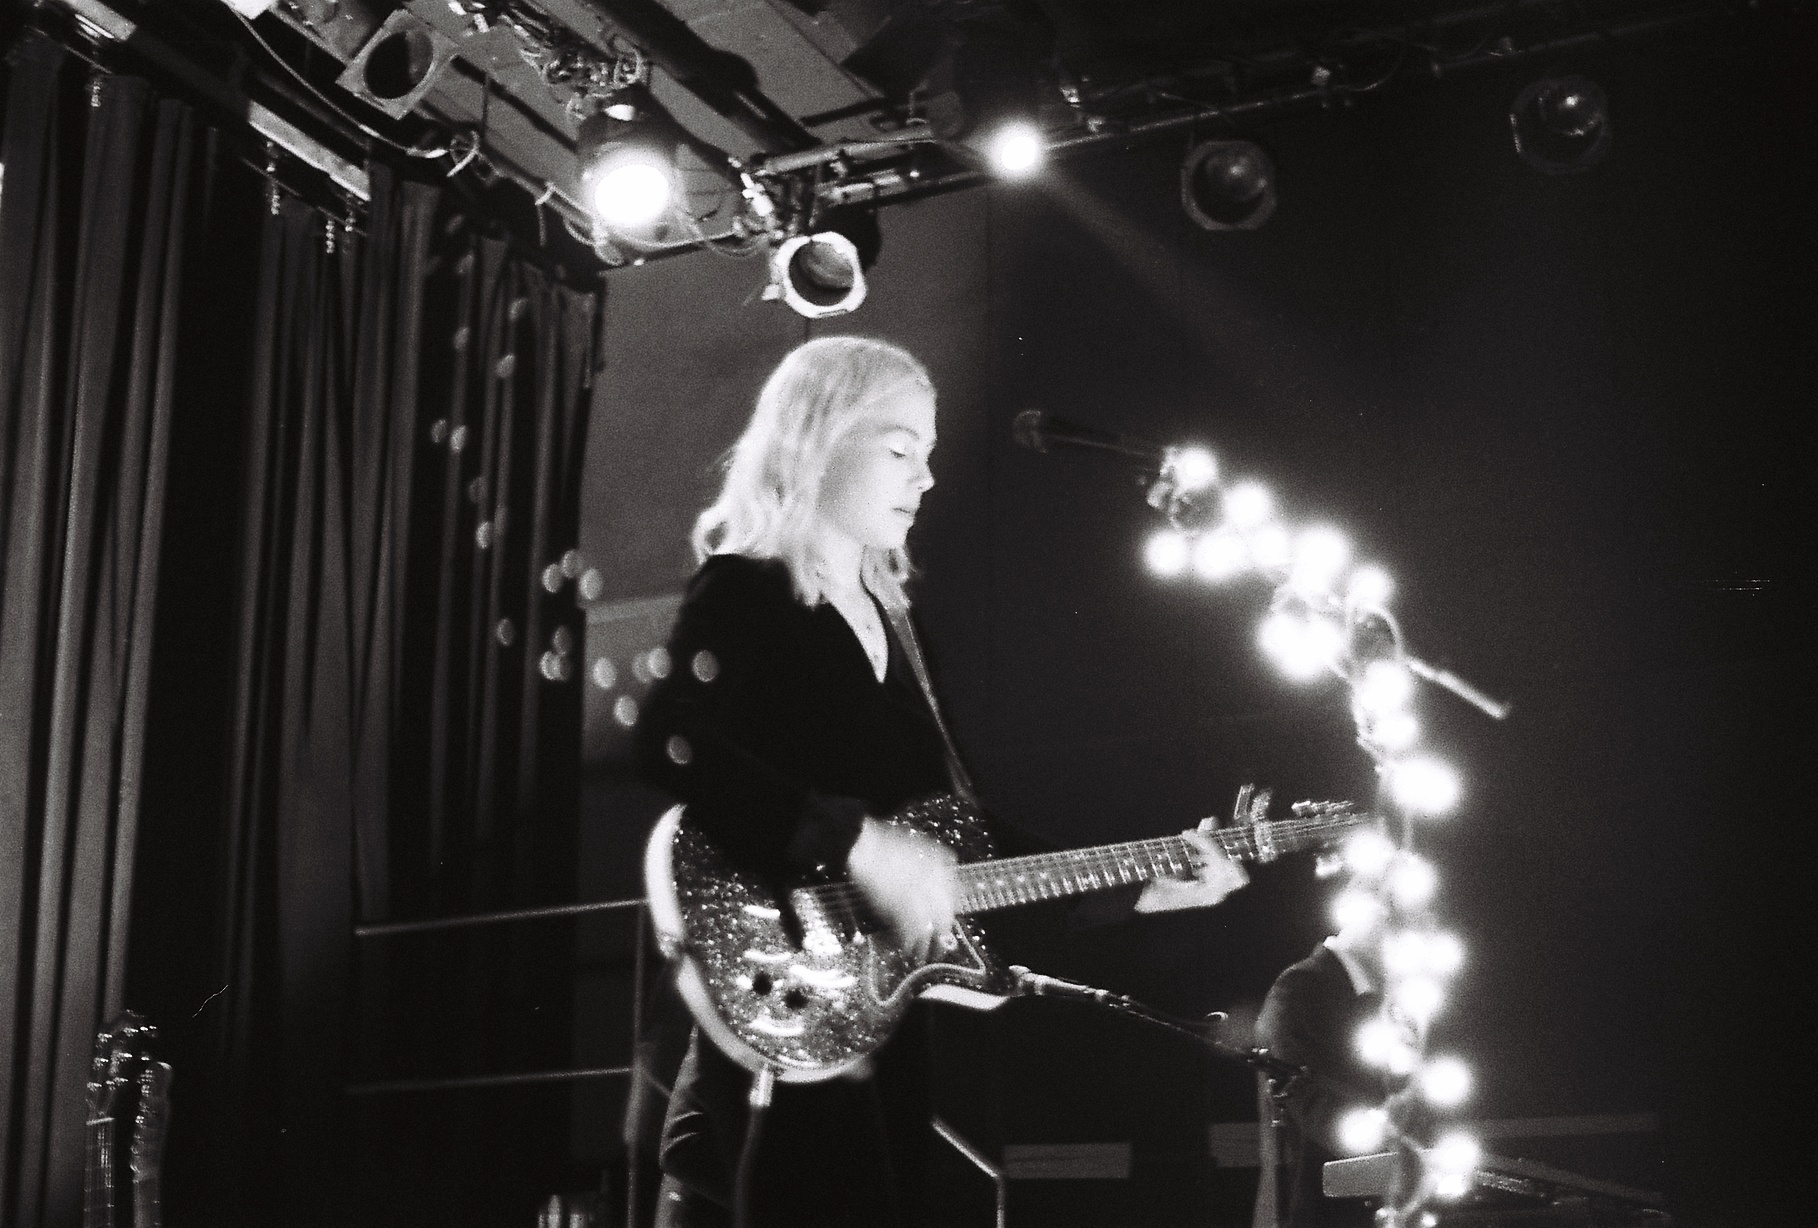 Phoebe Bridgers at Music Hall of Williamsburg, November 2017